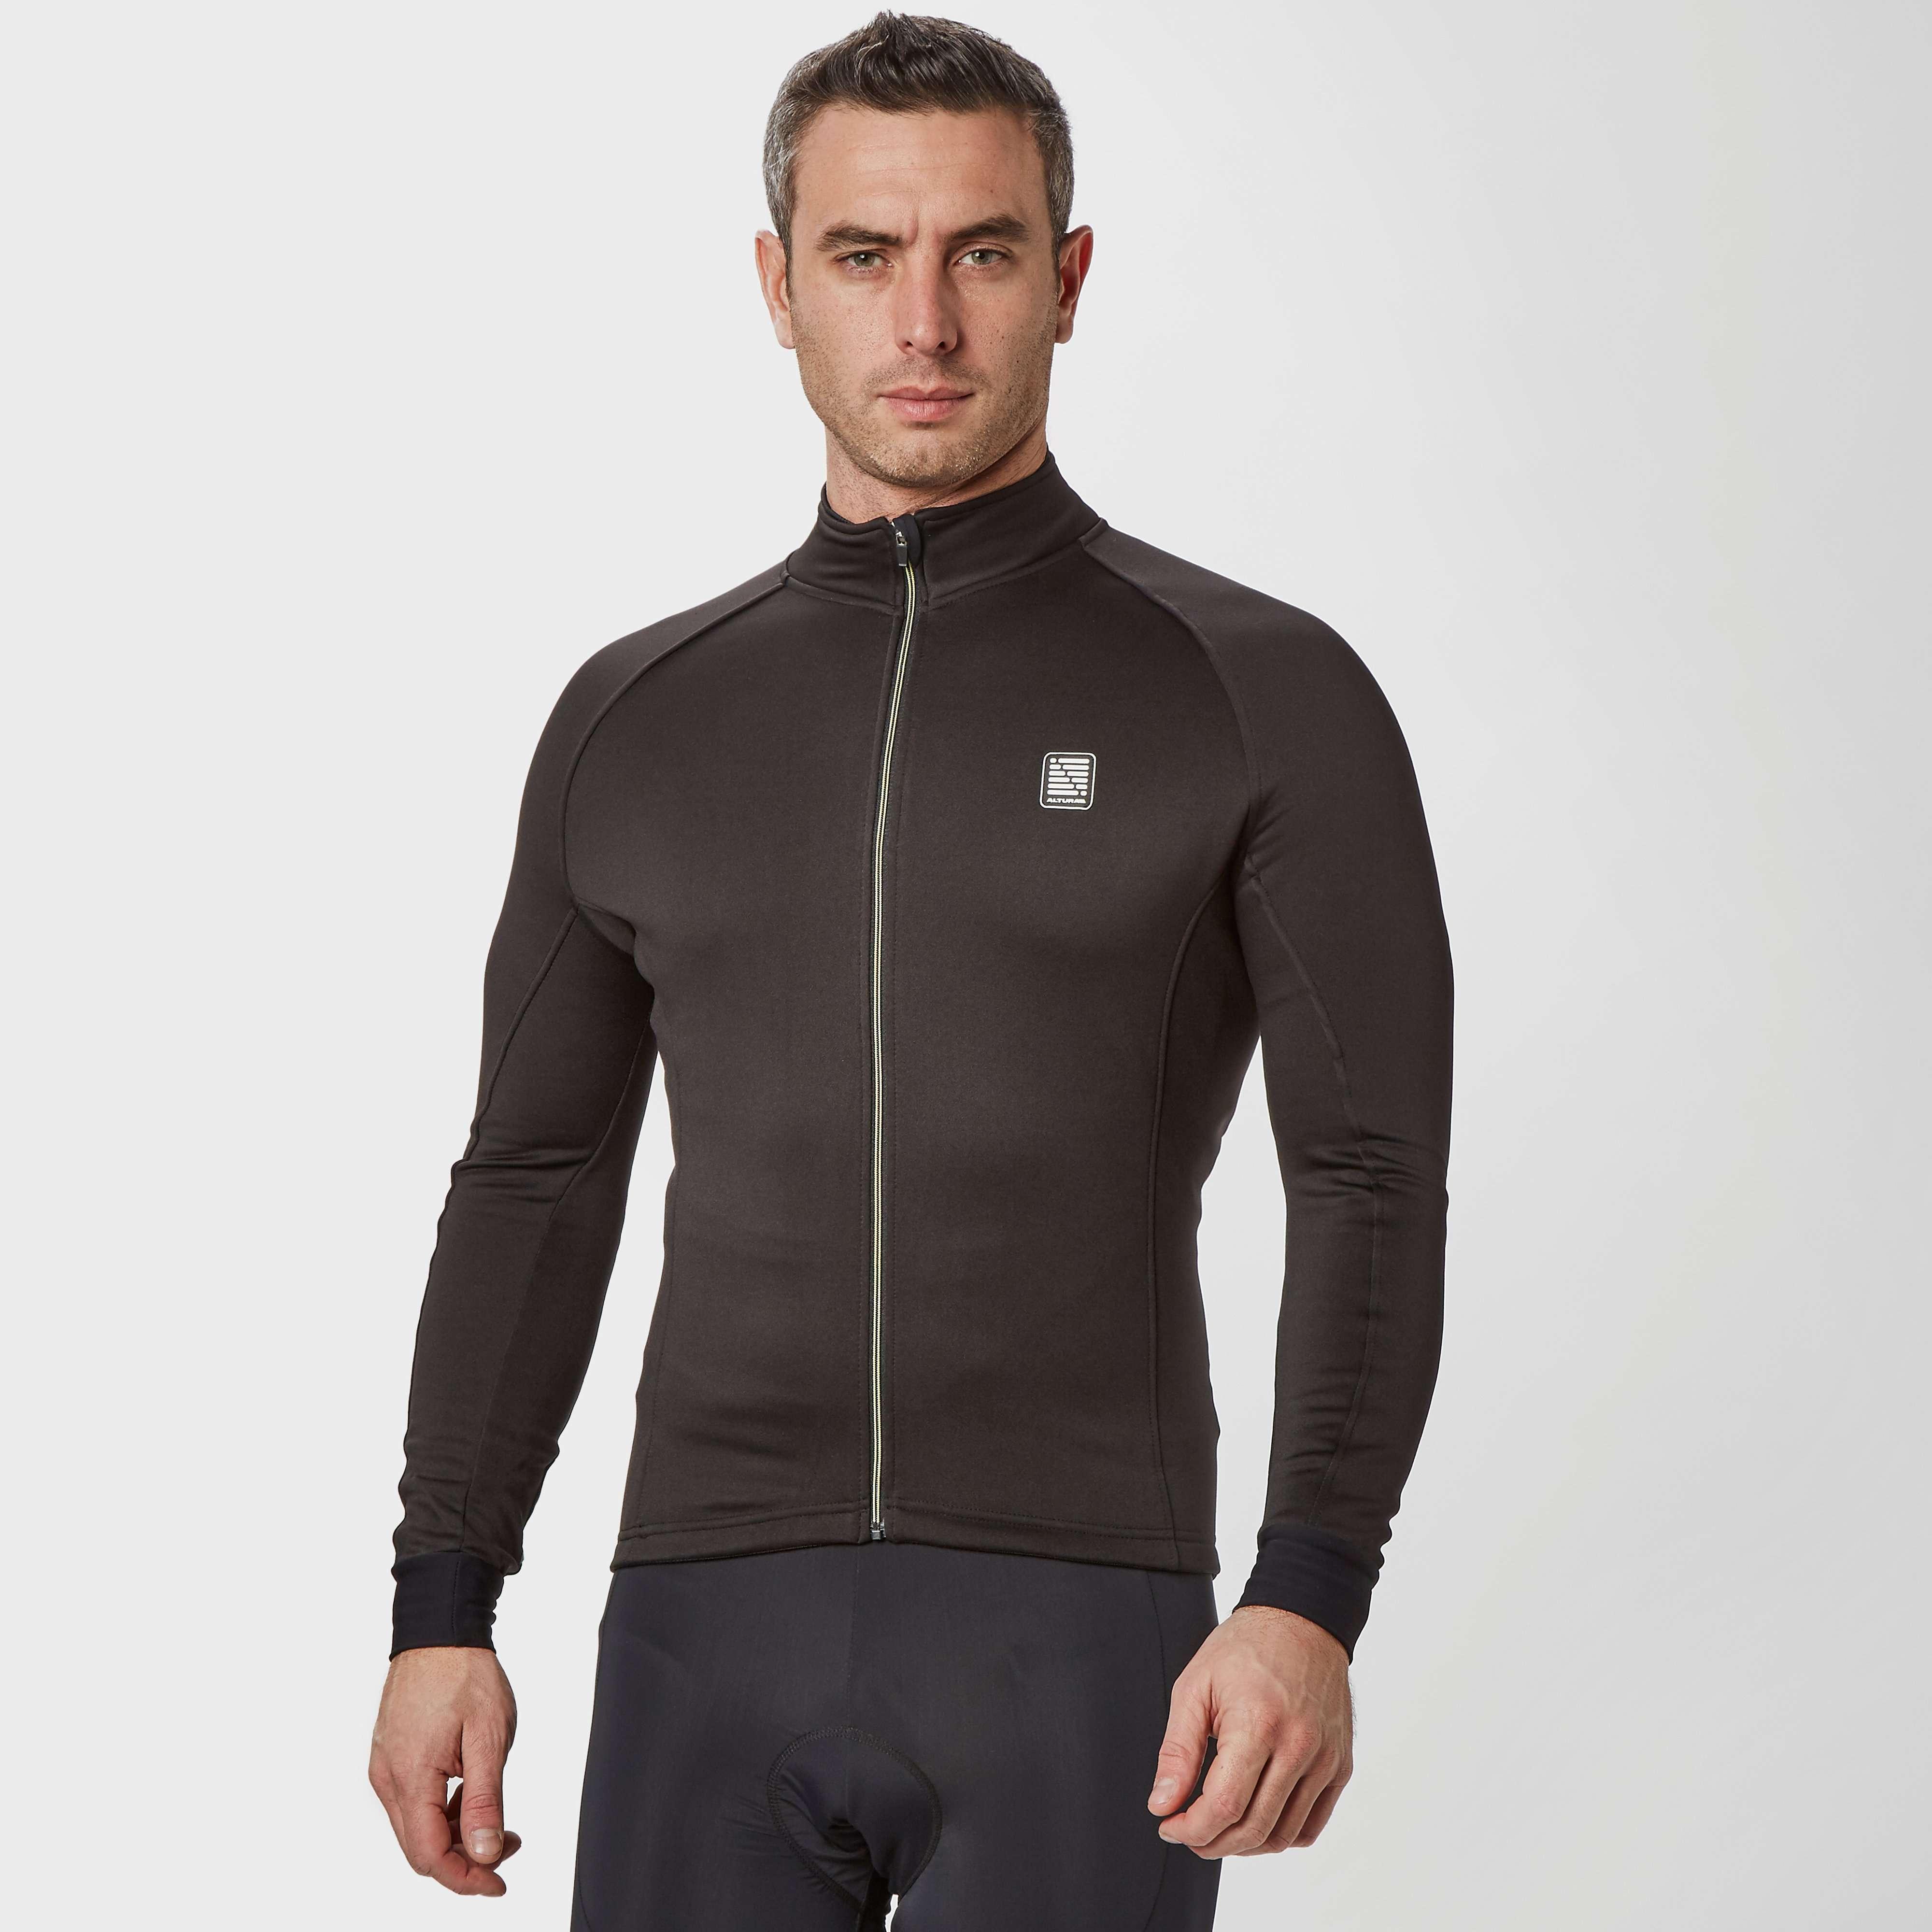 ALTURA Men's Peleton Long Sleeve Jersey